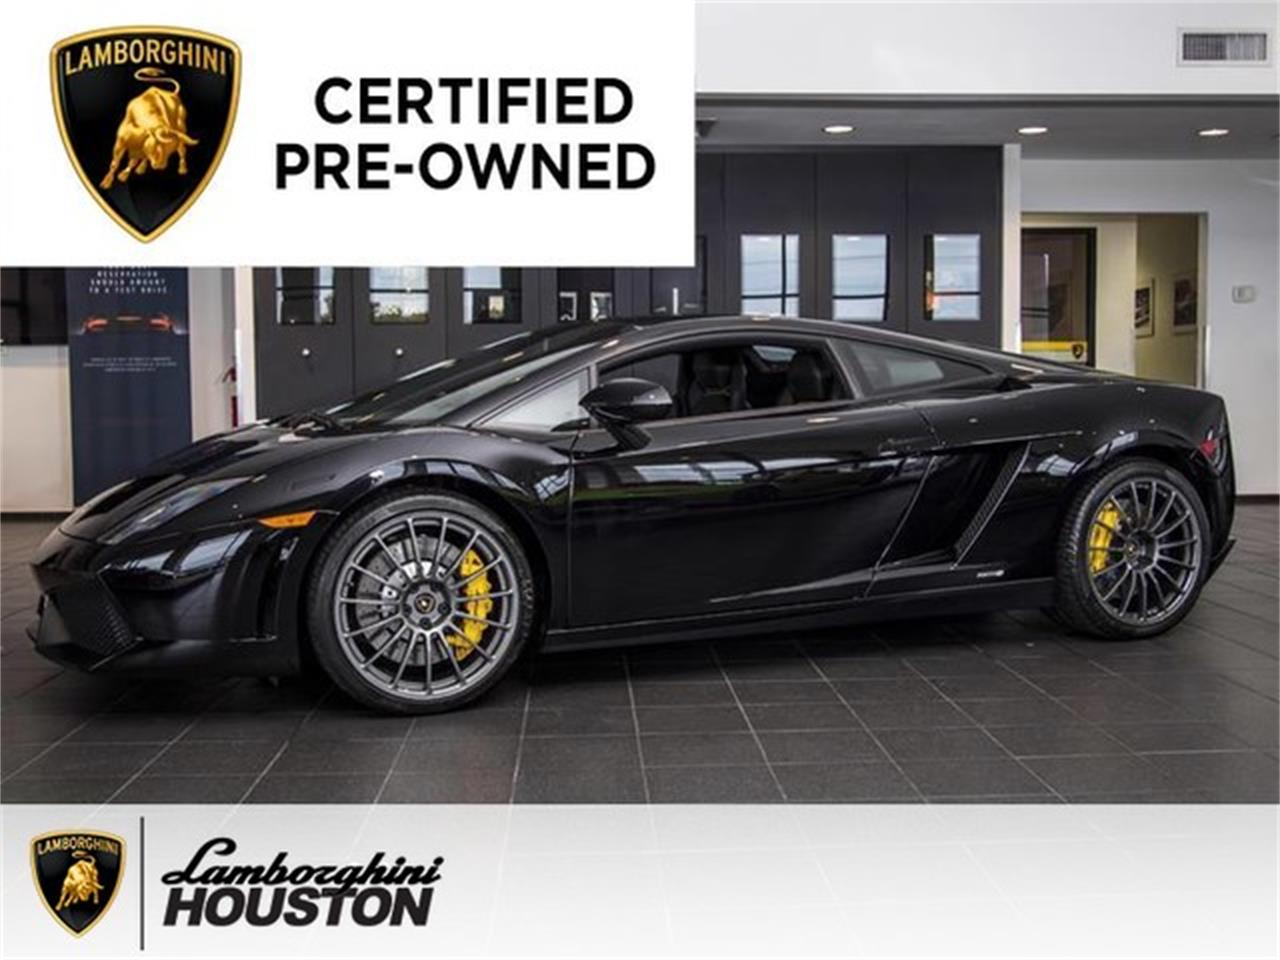 2013 Lamborghini Lp550 2 For Sale Classiccars Com Cc 930480